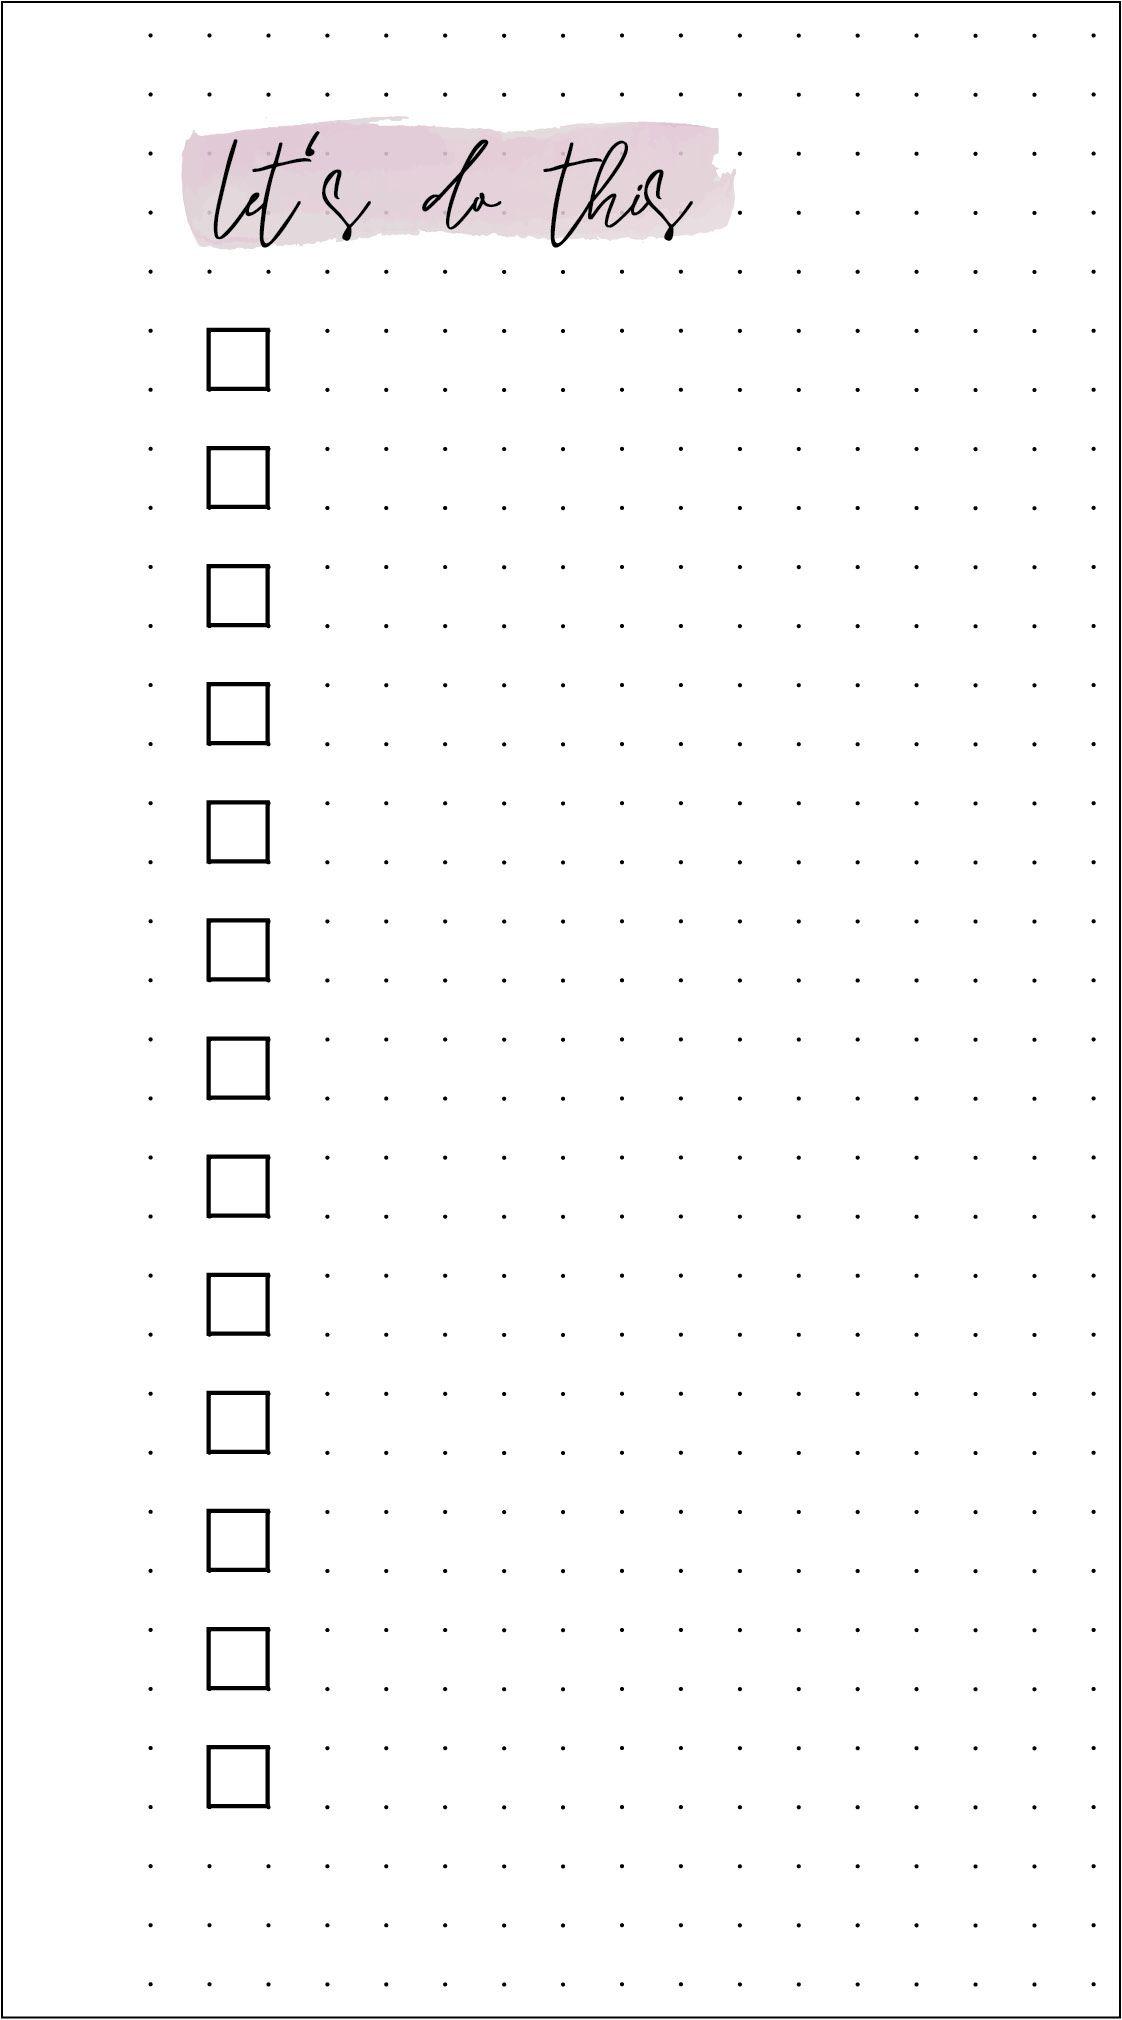 Filofax Monatsübersicht & To-do-Liste